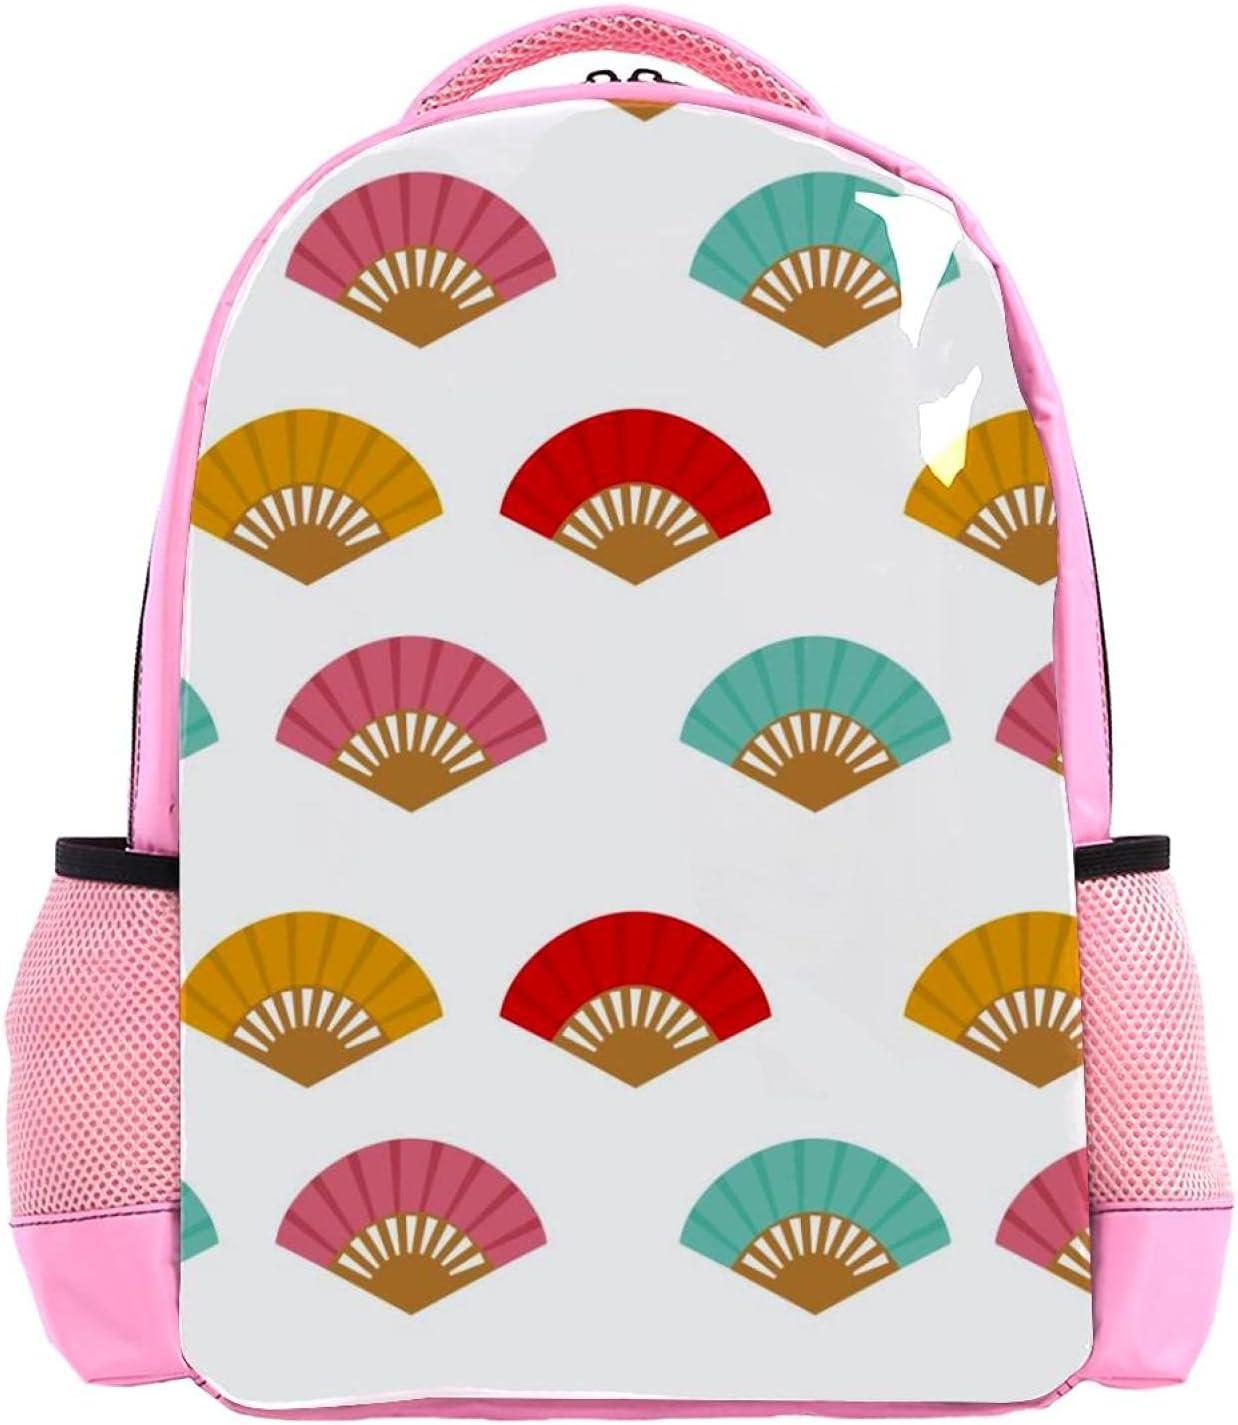 Backpack for Kids Girls Boys Waterproof OFFicial mail order Fan Patt 5 ☆ very popular Travel